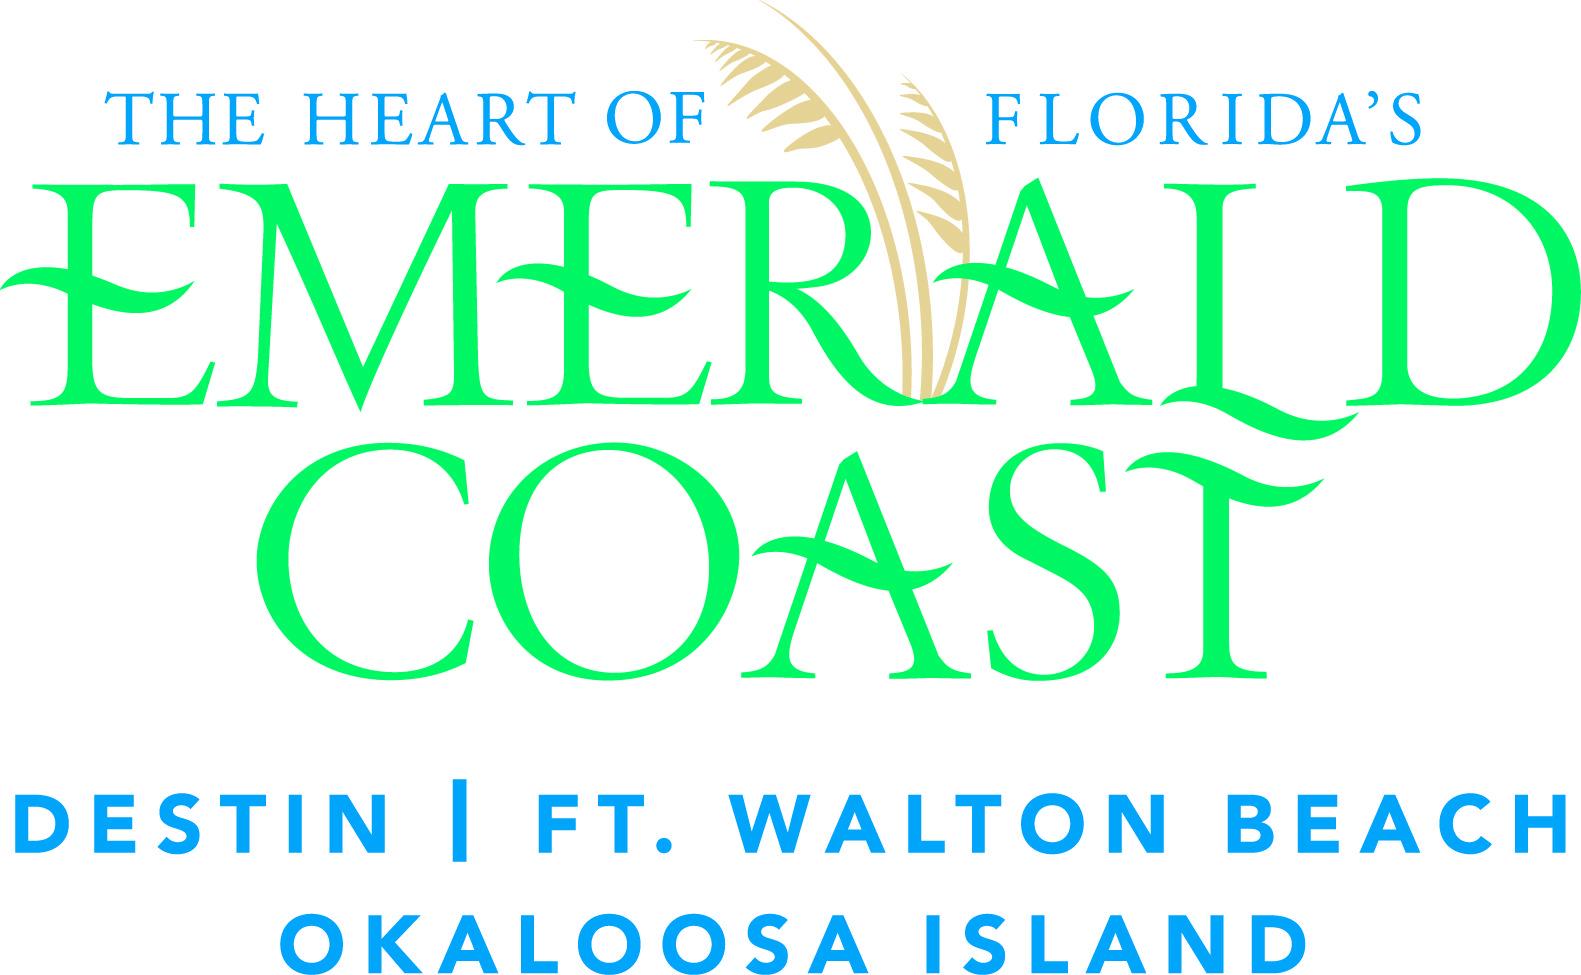 Heart of Florida's Emerald Coast Logo copy